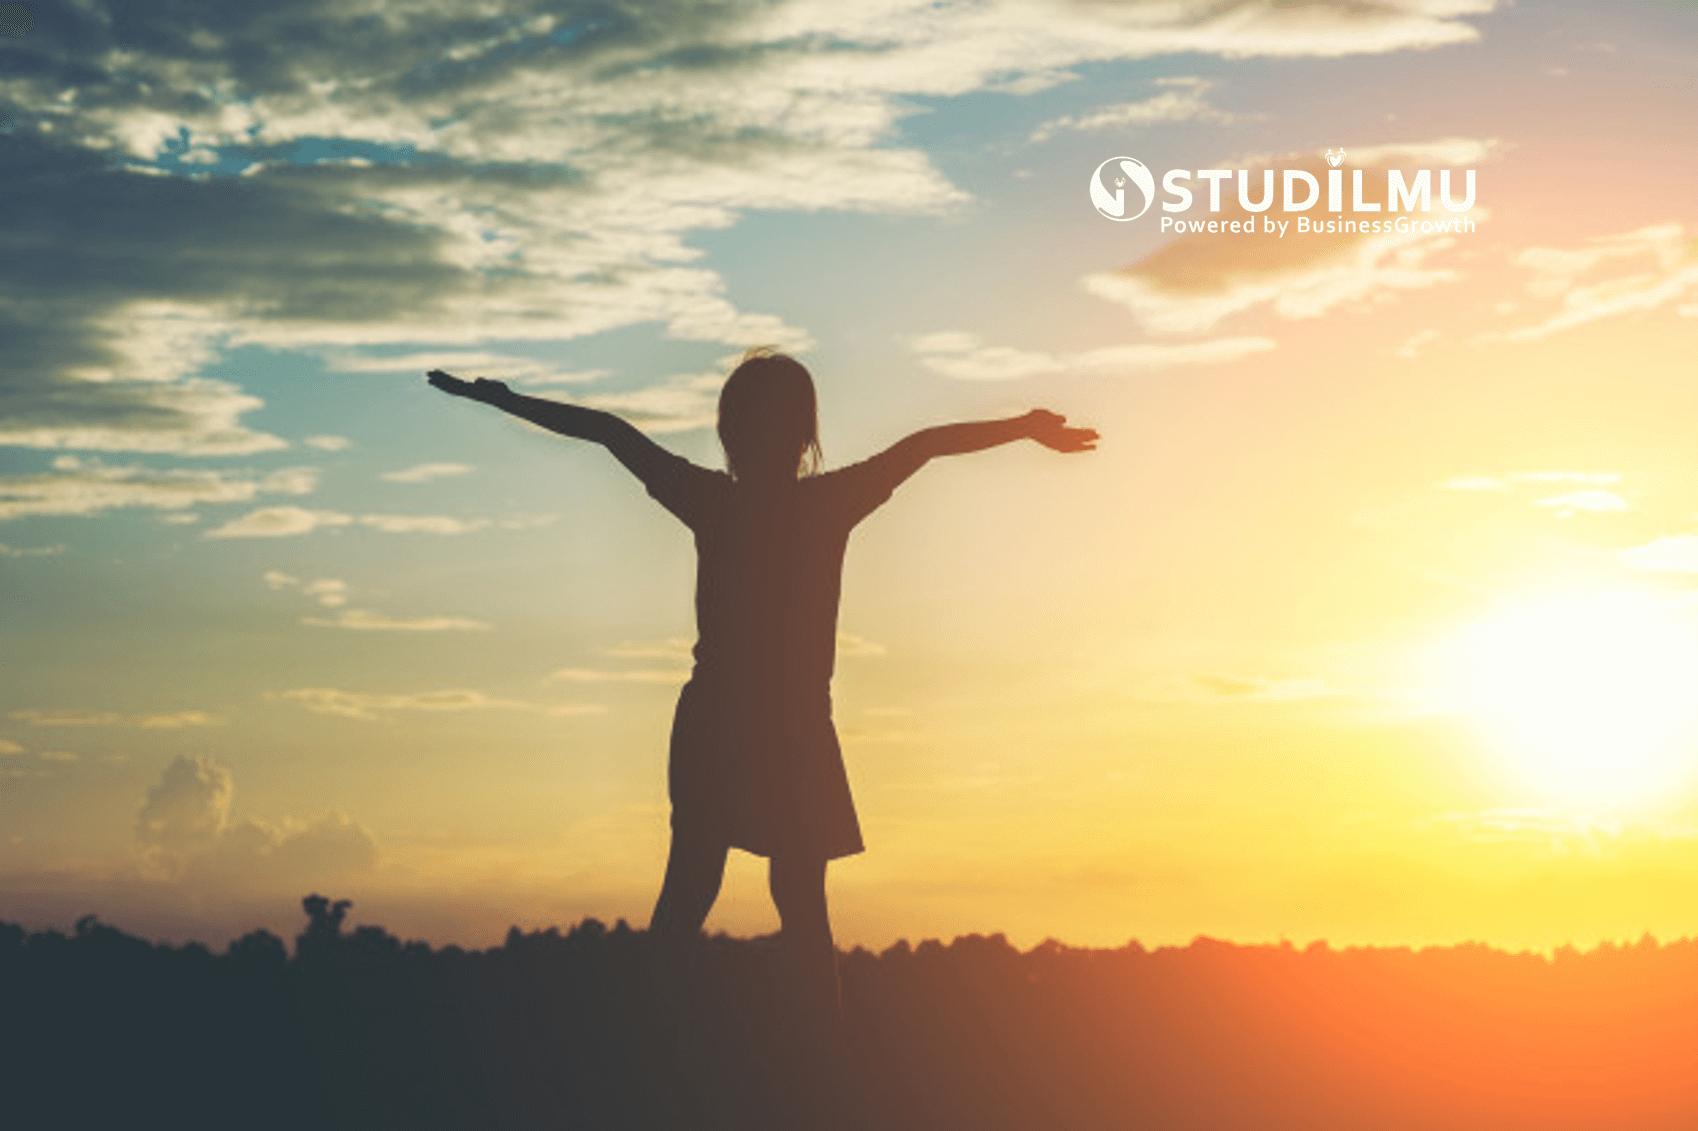 STUDILMU Career Advice - 5 Cara untuk Mengungkapkan Rasa Syukur Setiap Hari